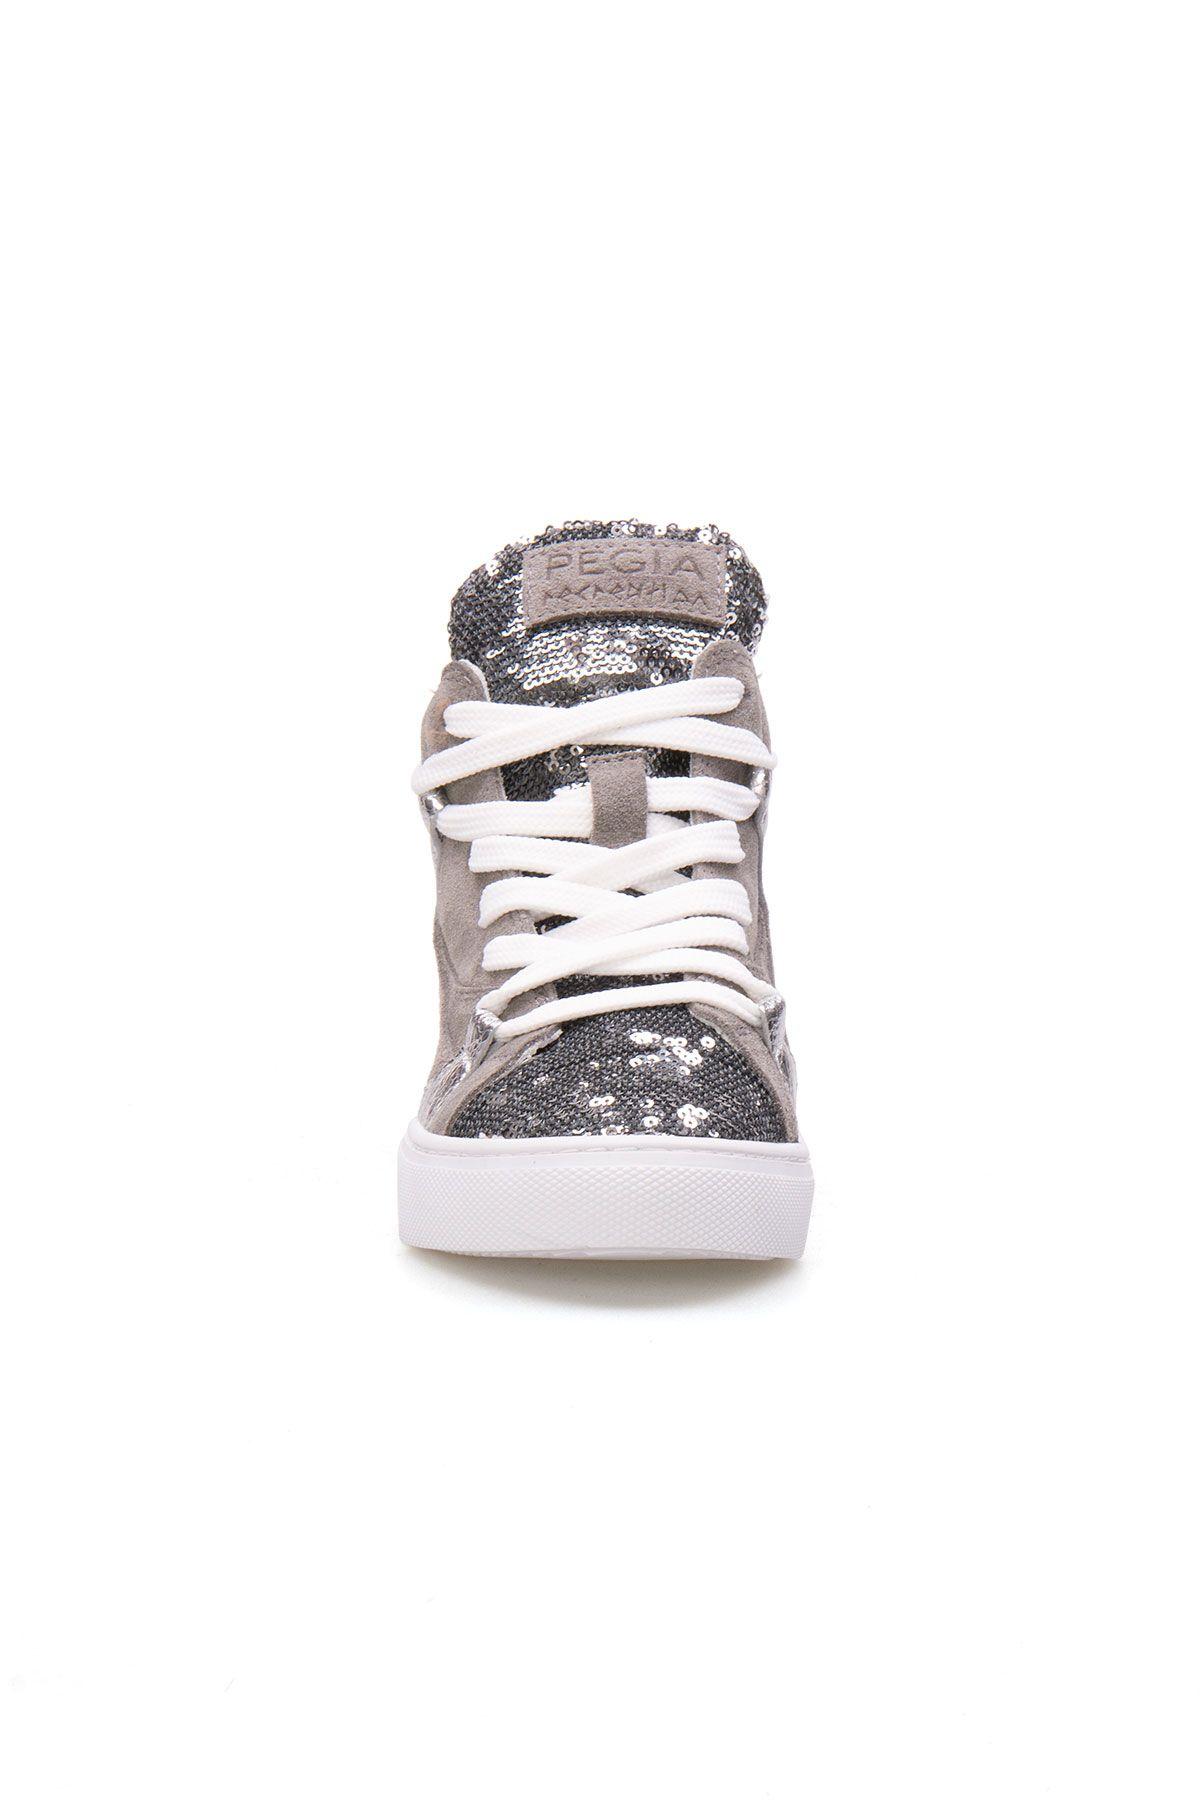 Pegia Genuine Leather Sequined Women's Sneaker LA1403 Gray